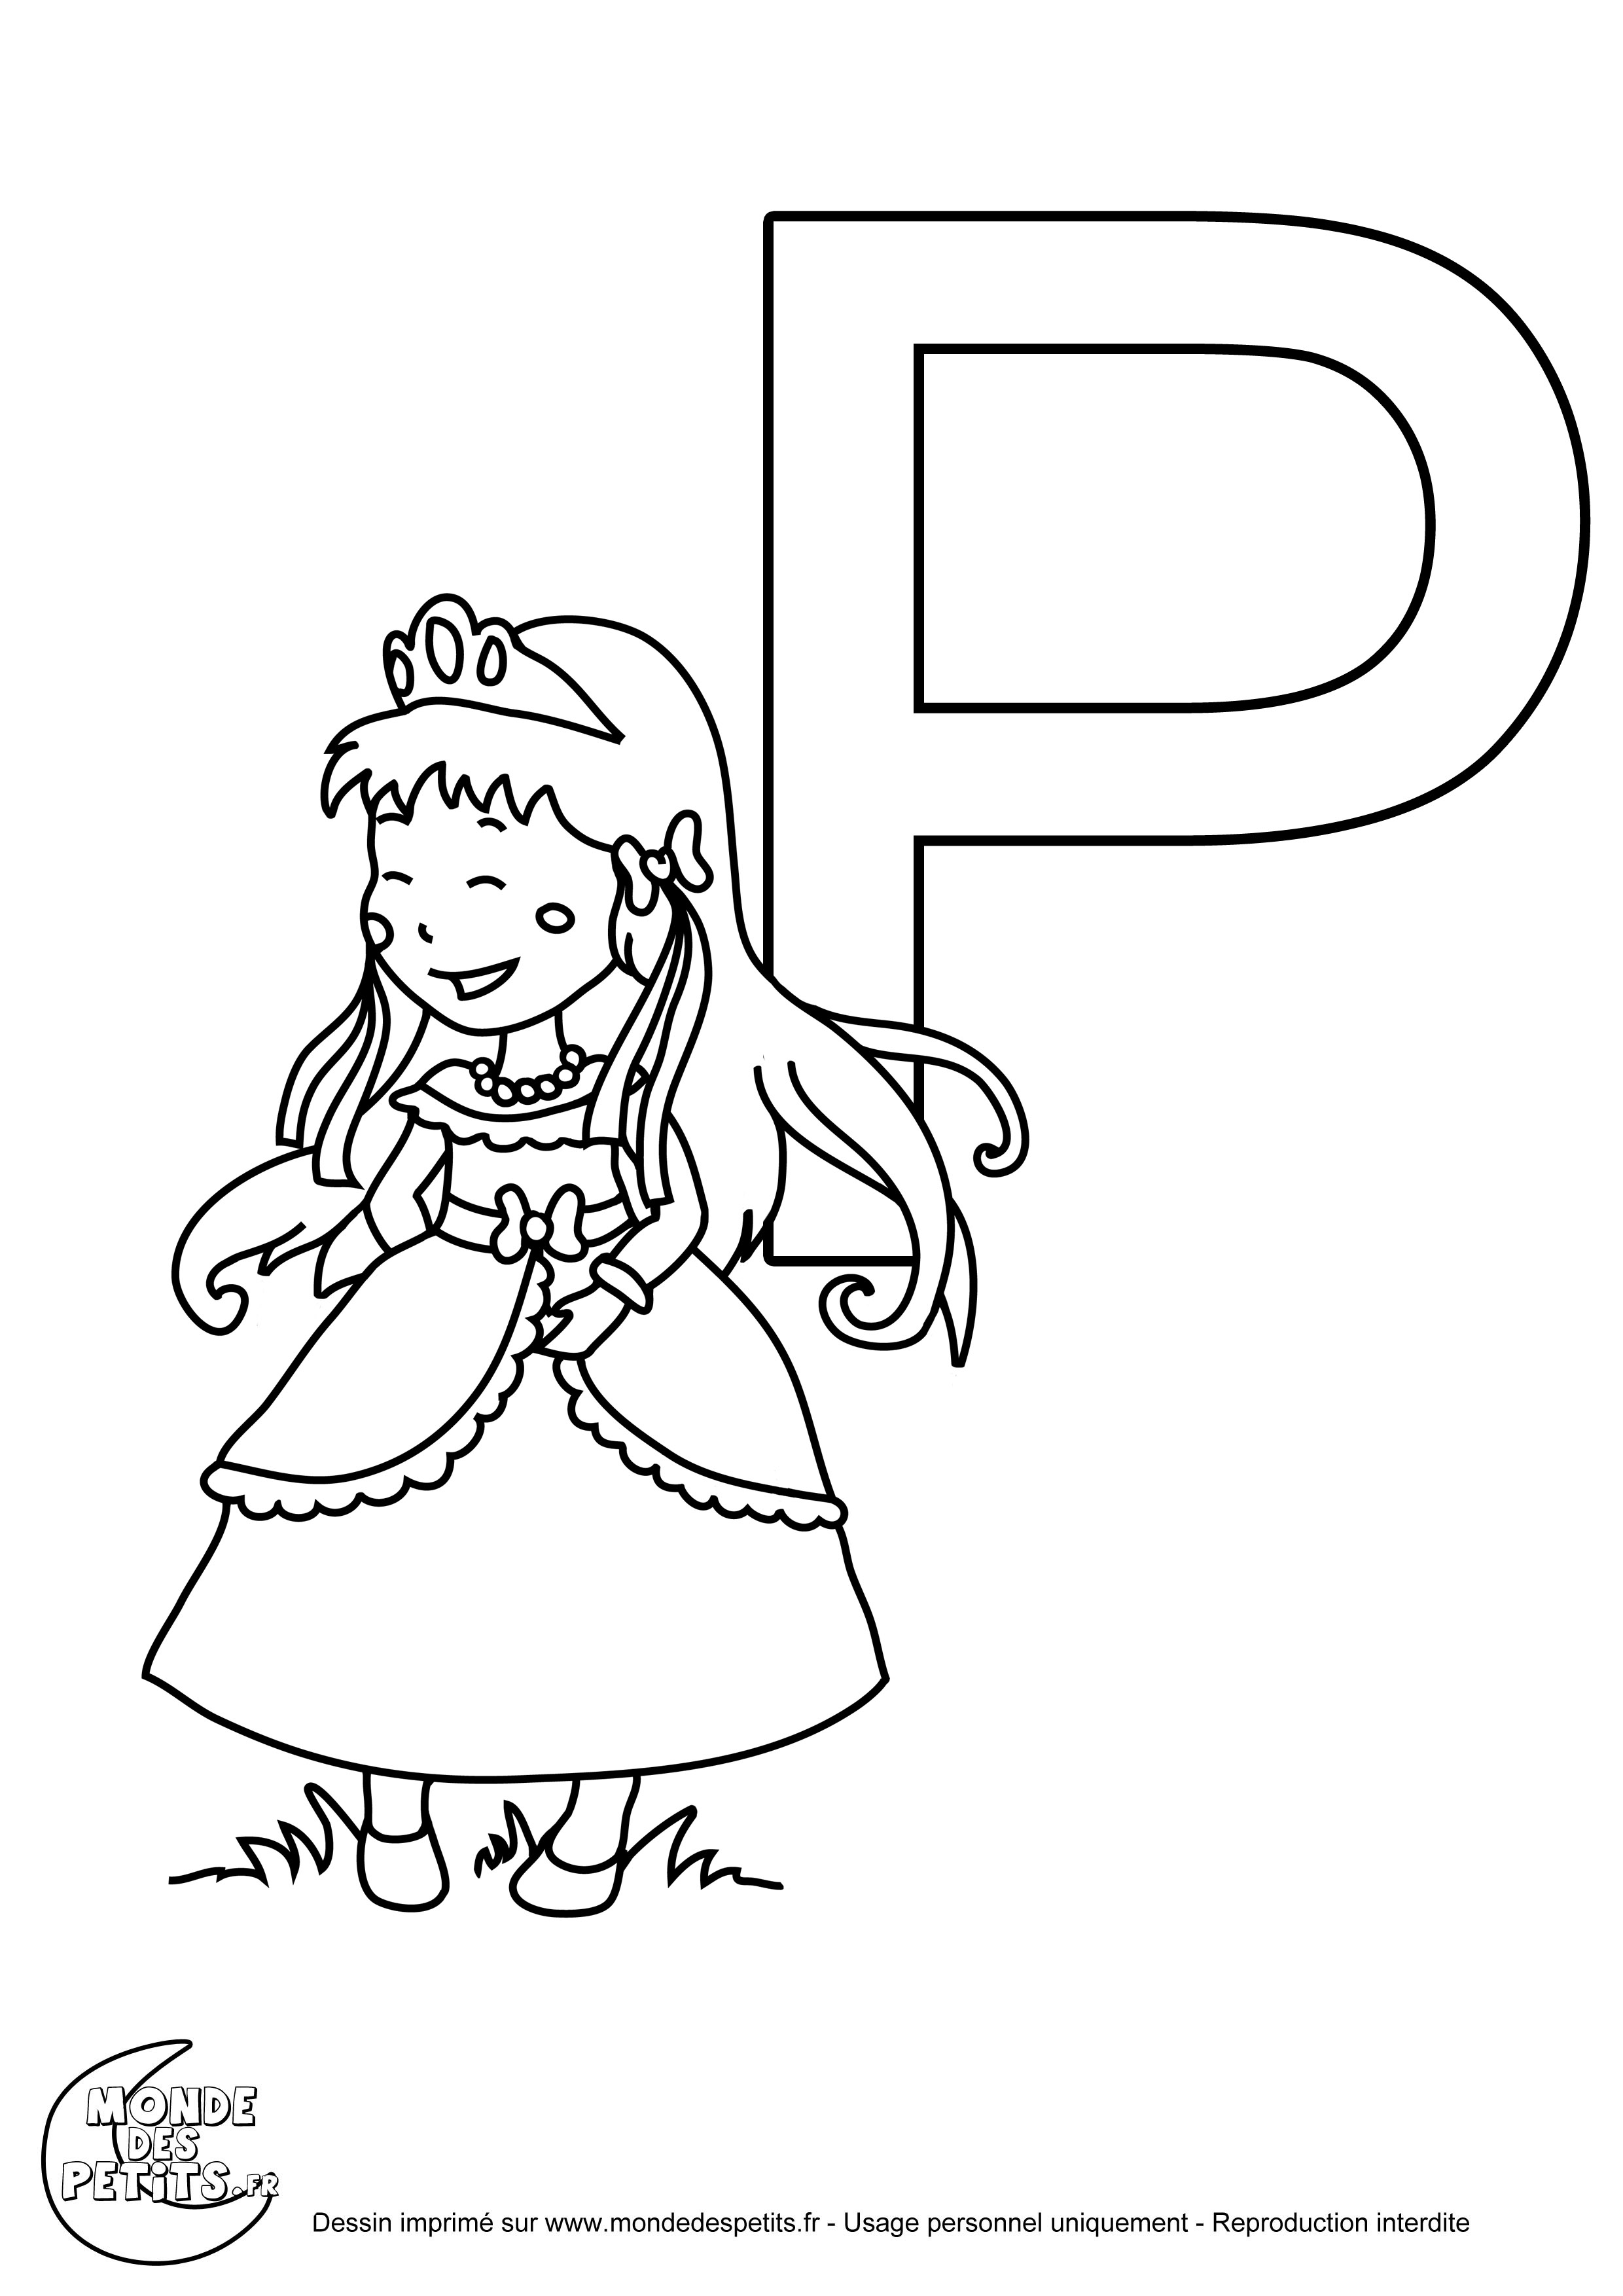 Alphabet en lettre majuscule oq91 montrealeast - Alphabet majuscule a imprimer ...